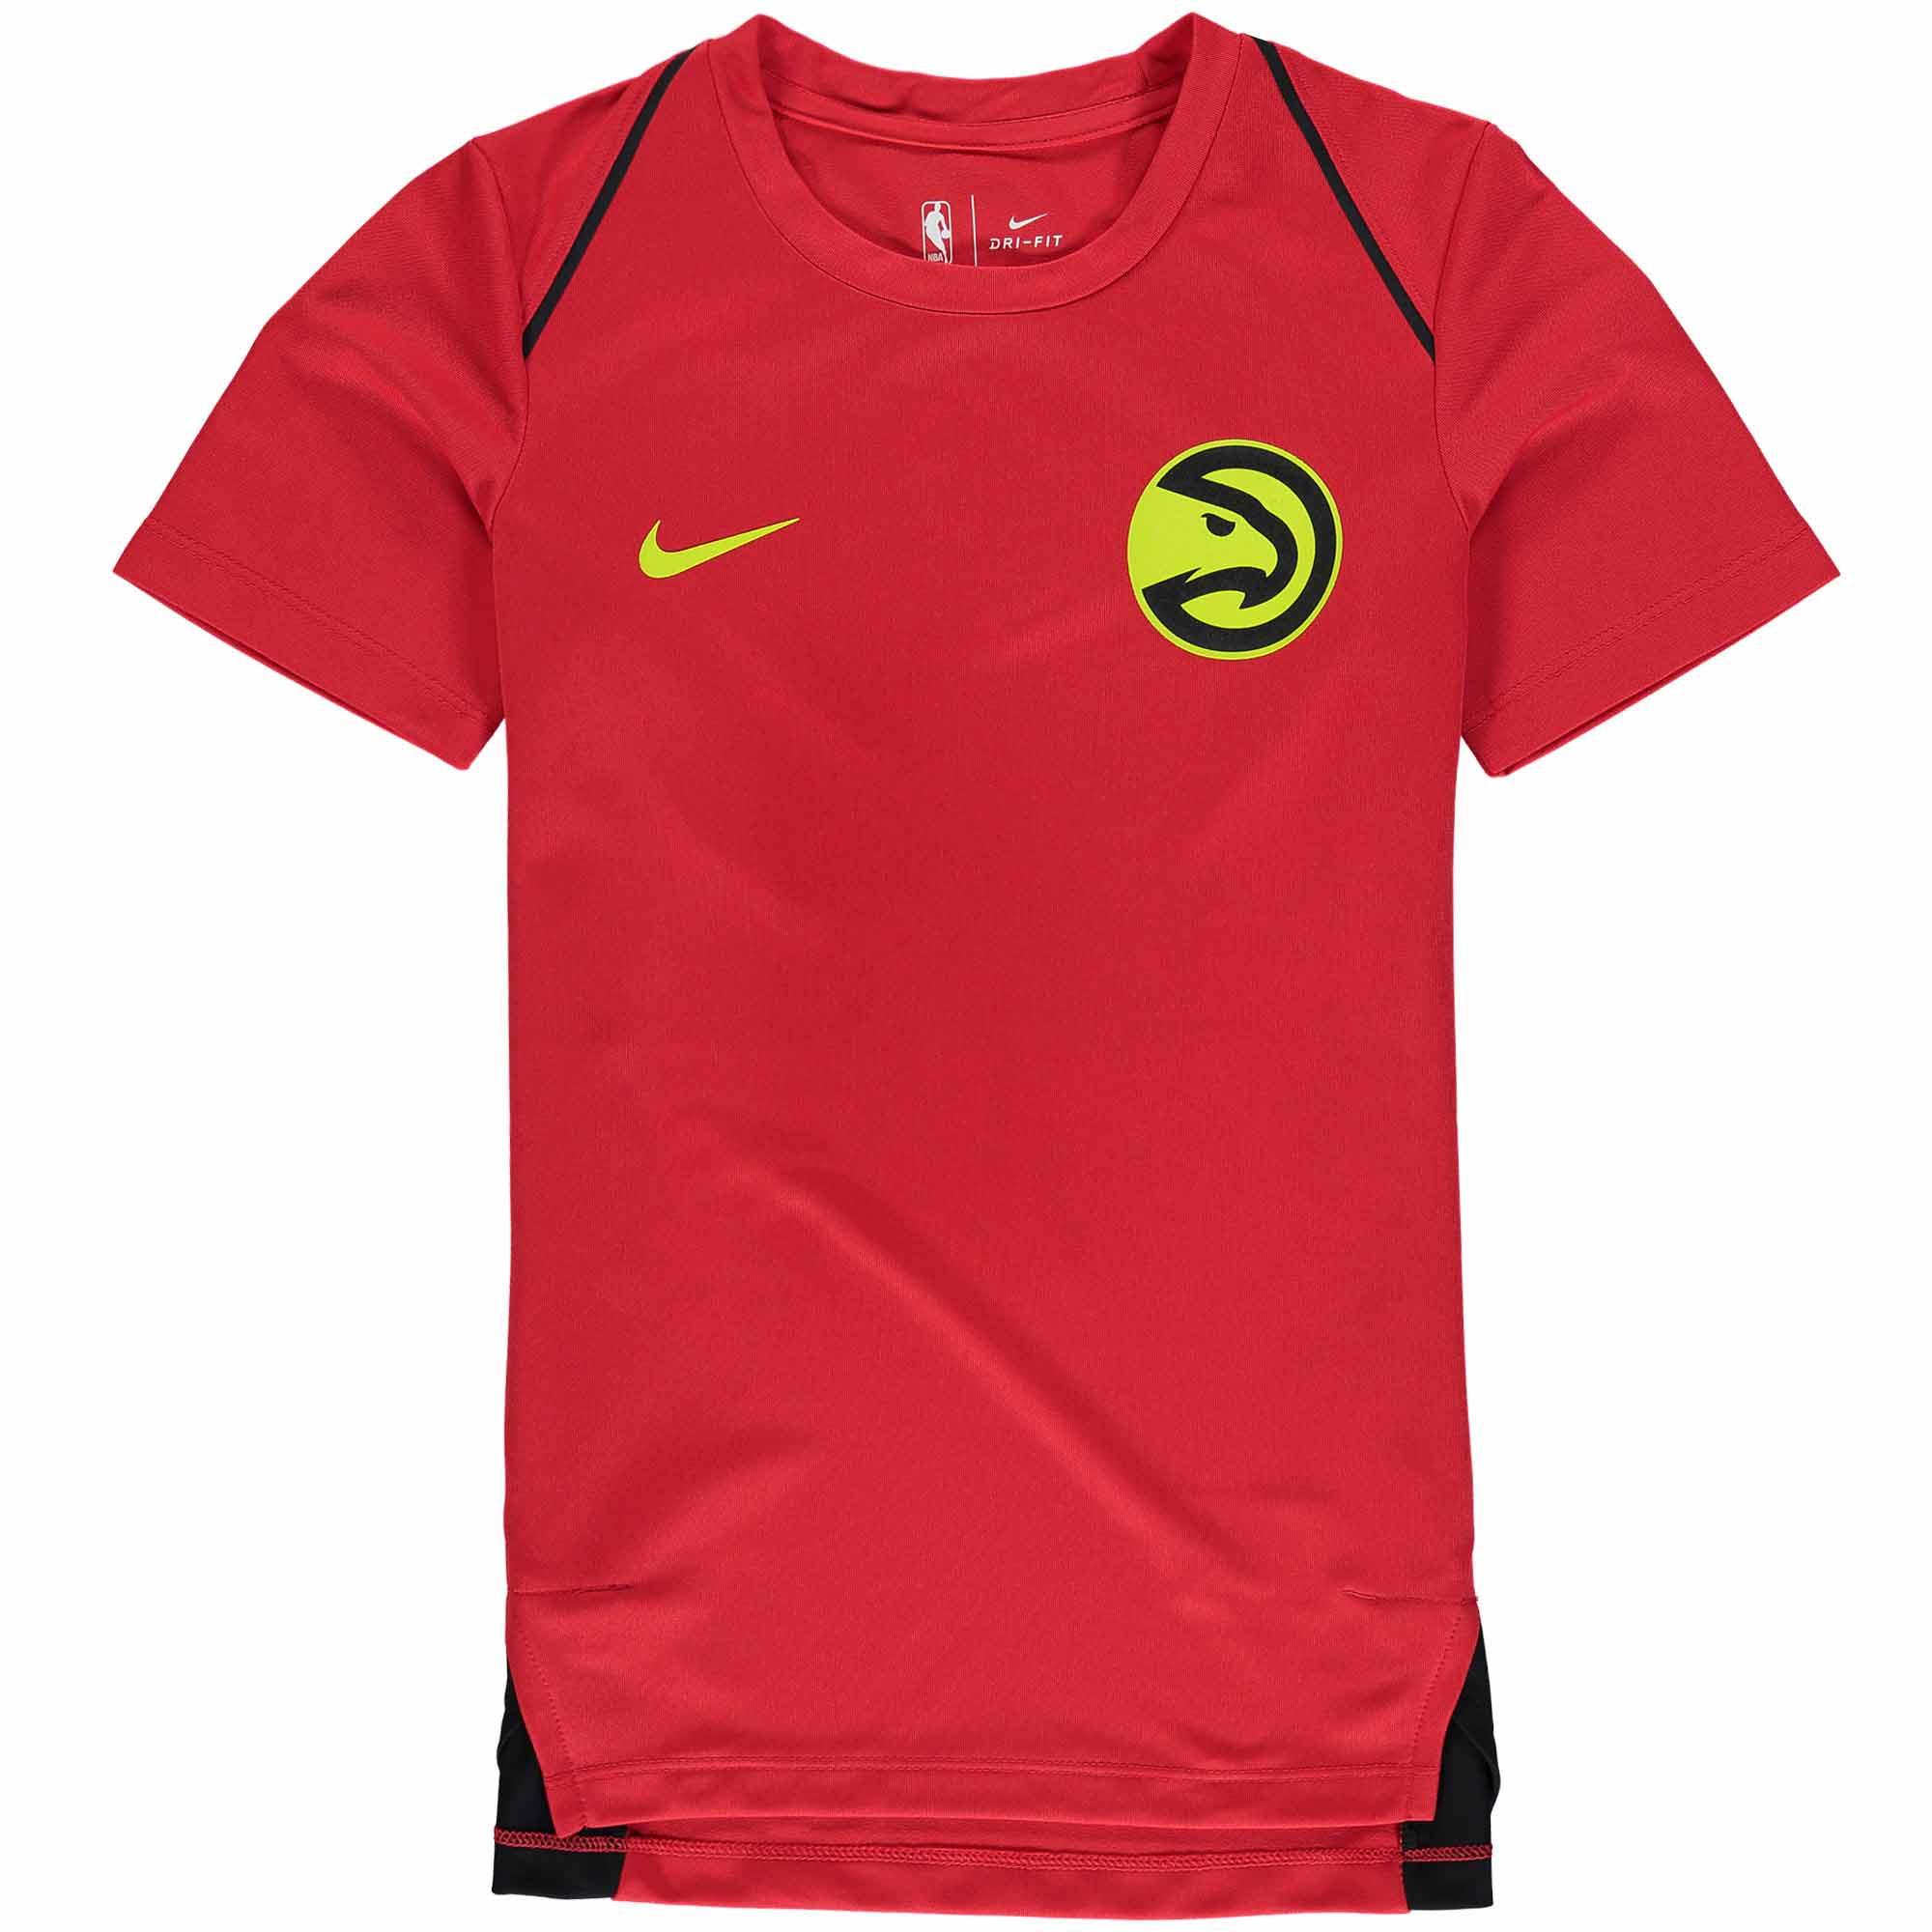 Atlanta Hawks Nike Youth Hyperelite Shooter Performance T-Shirt - Red